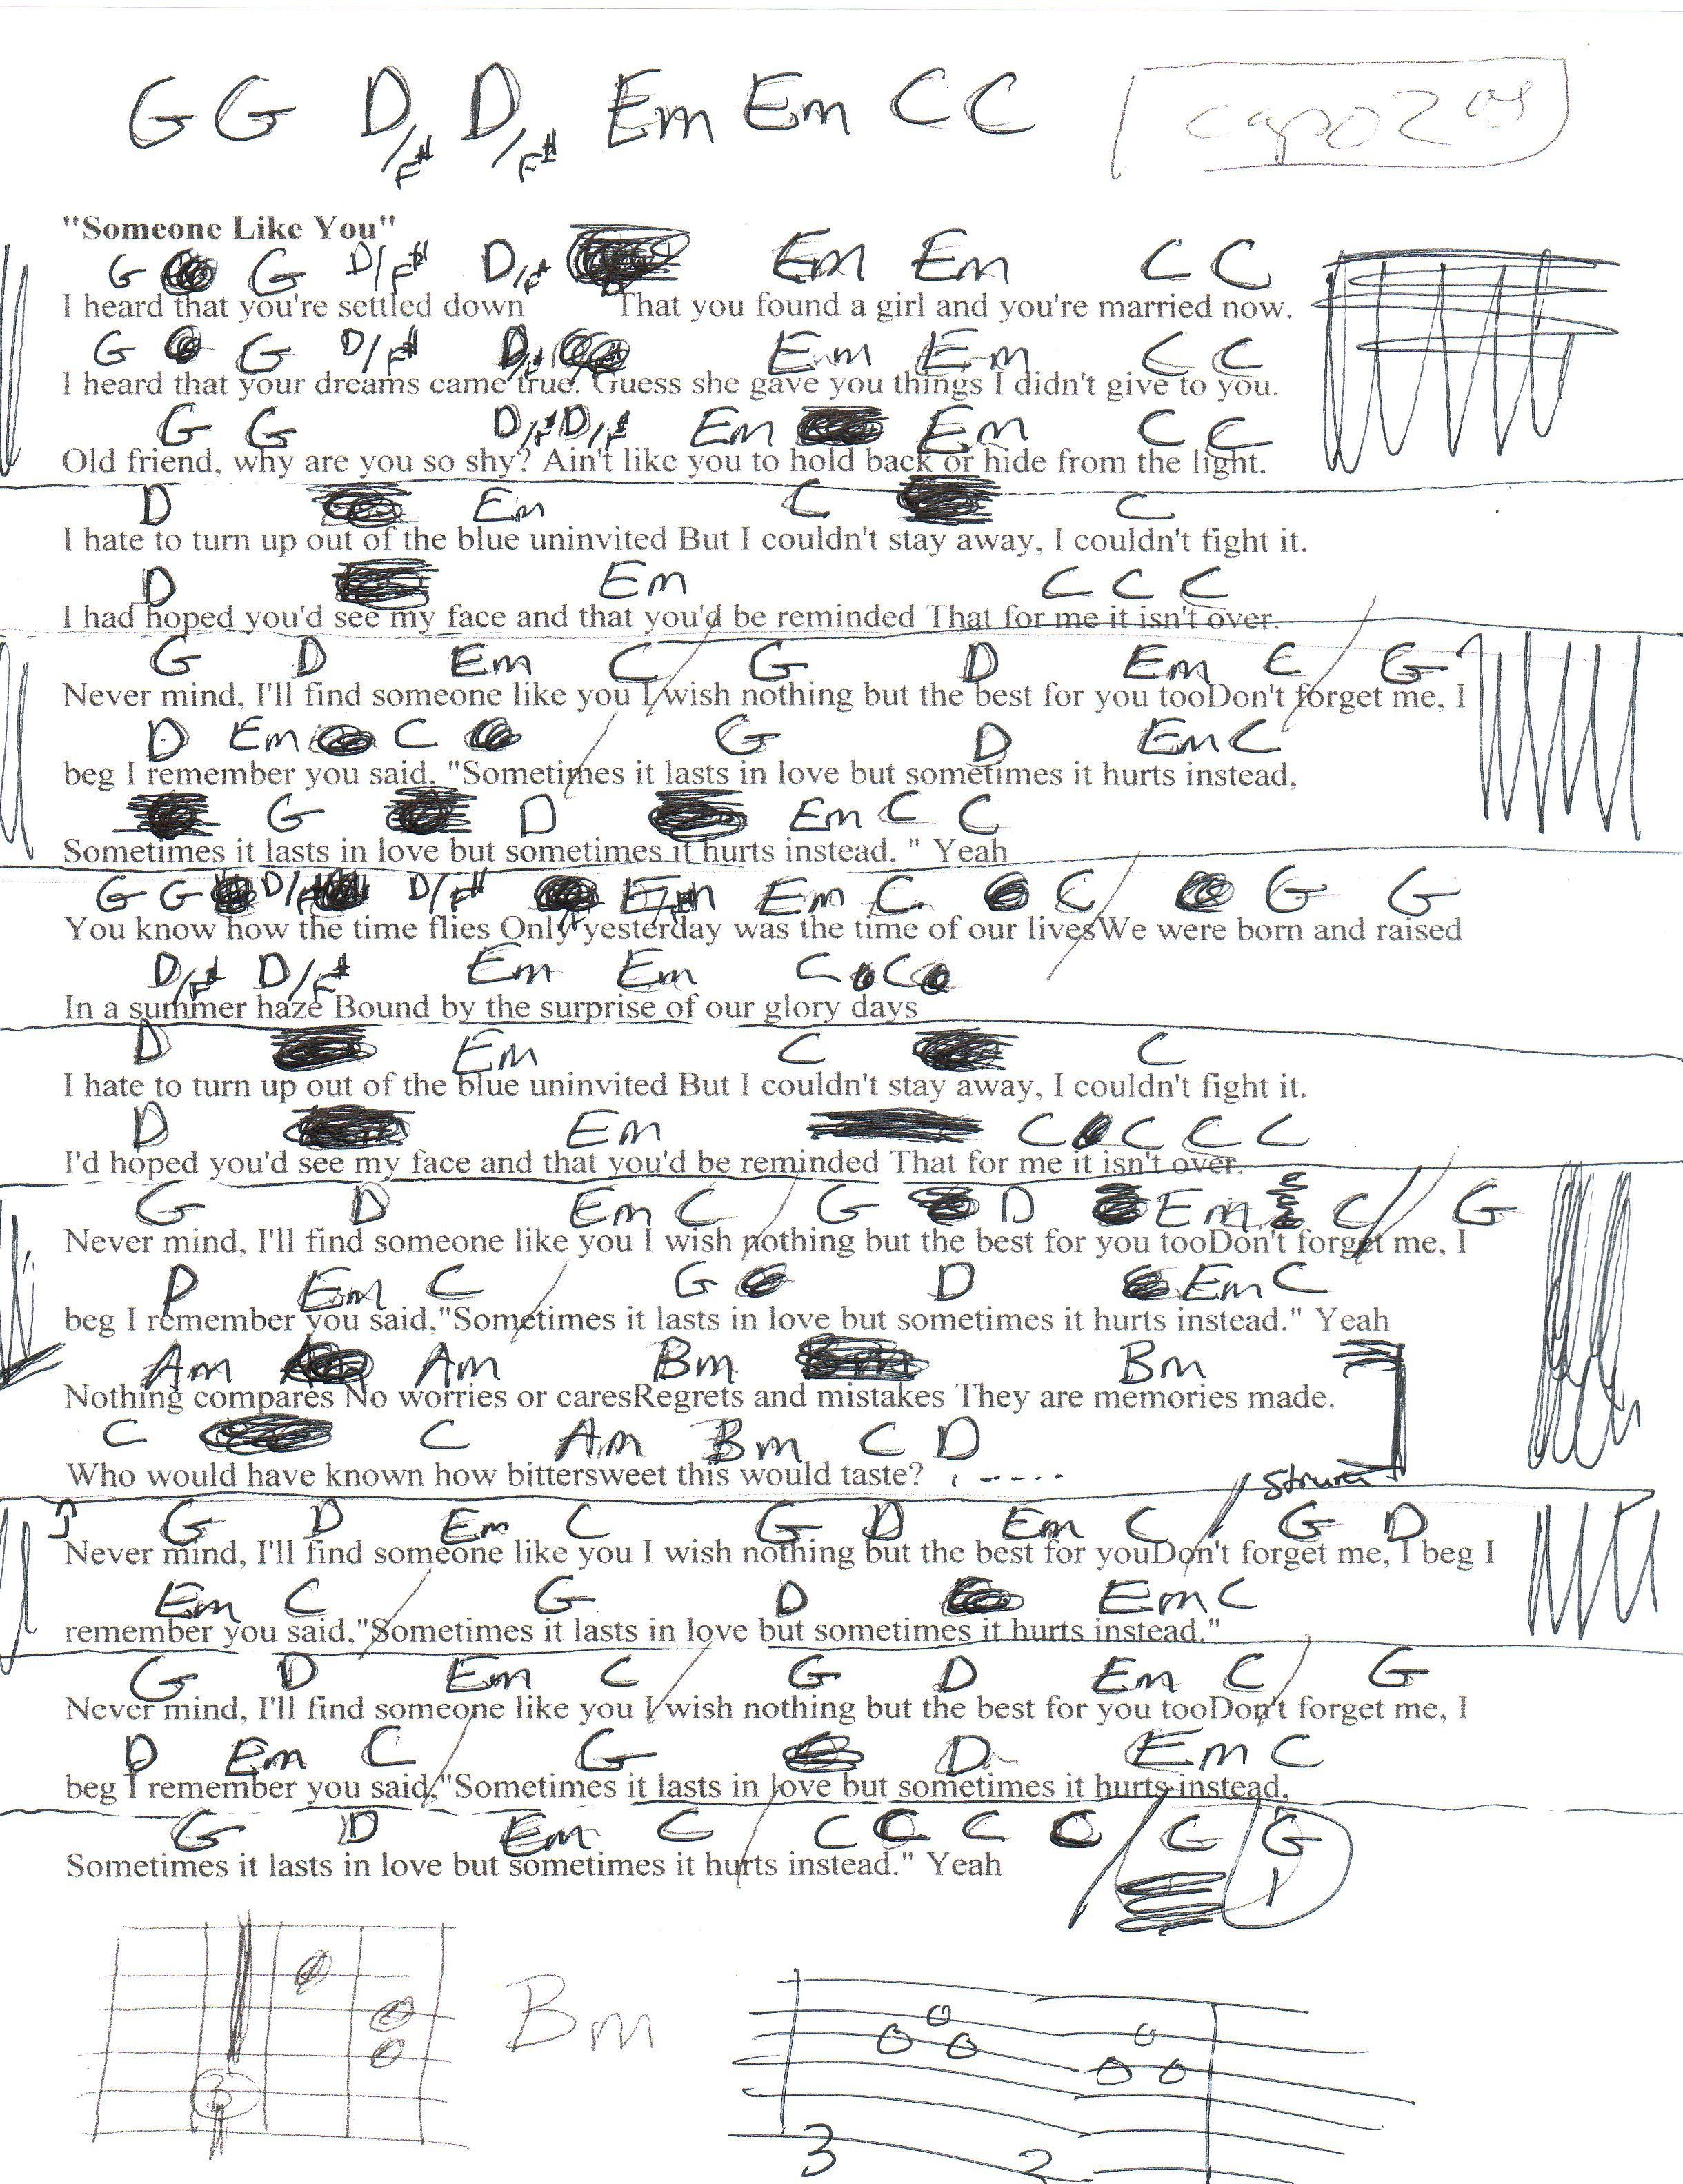 Someone Like You (Adele) Guitar Chord Chart - Capo 2nd ...